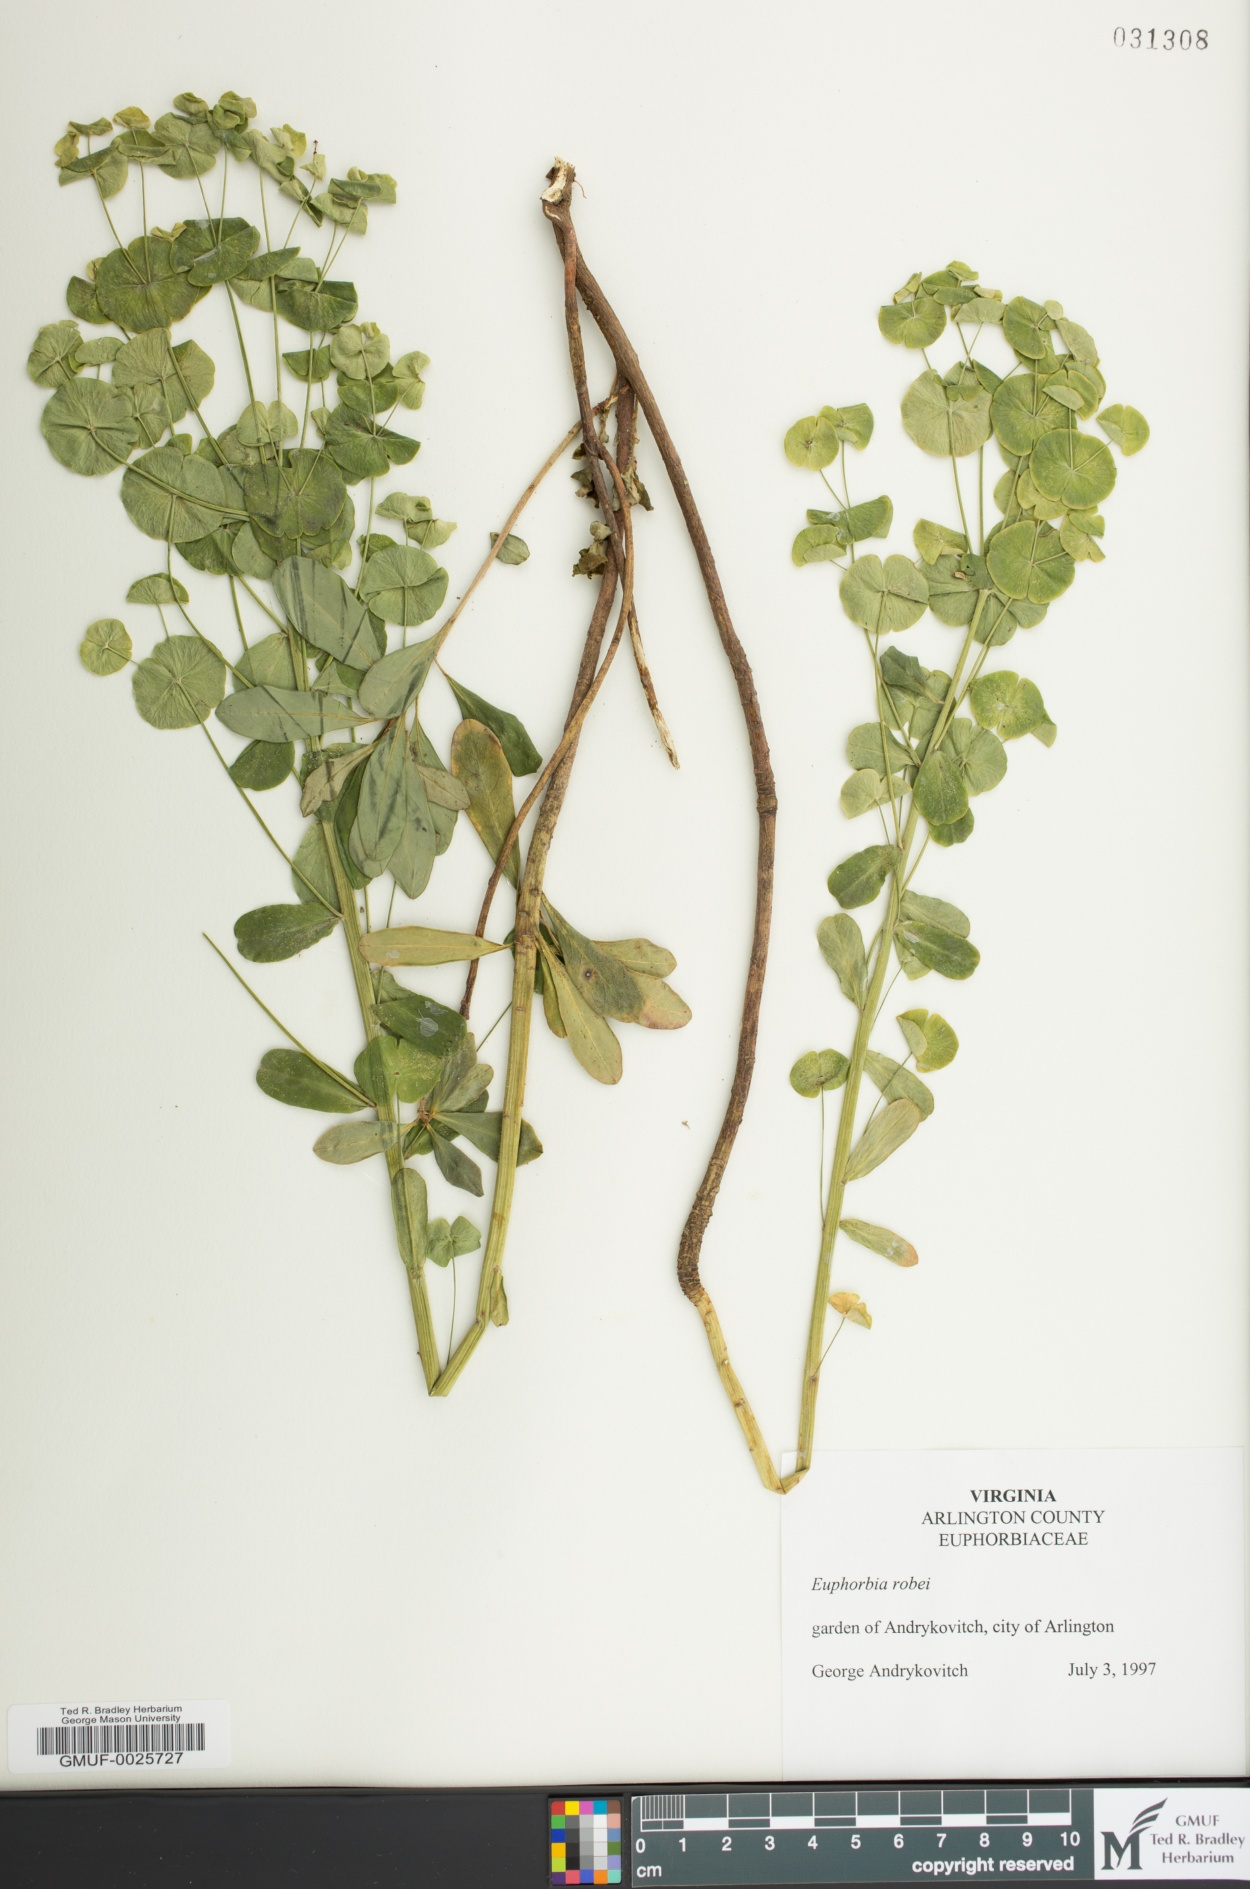 Euphorbia amygdaloides subsp. robbiae image